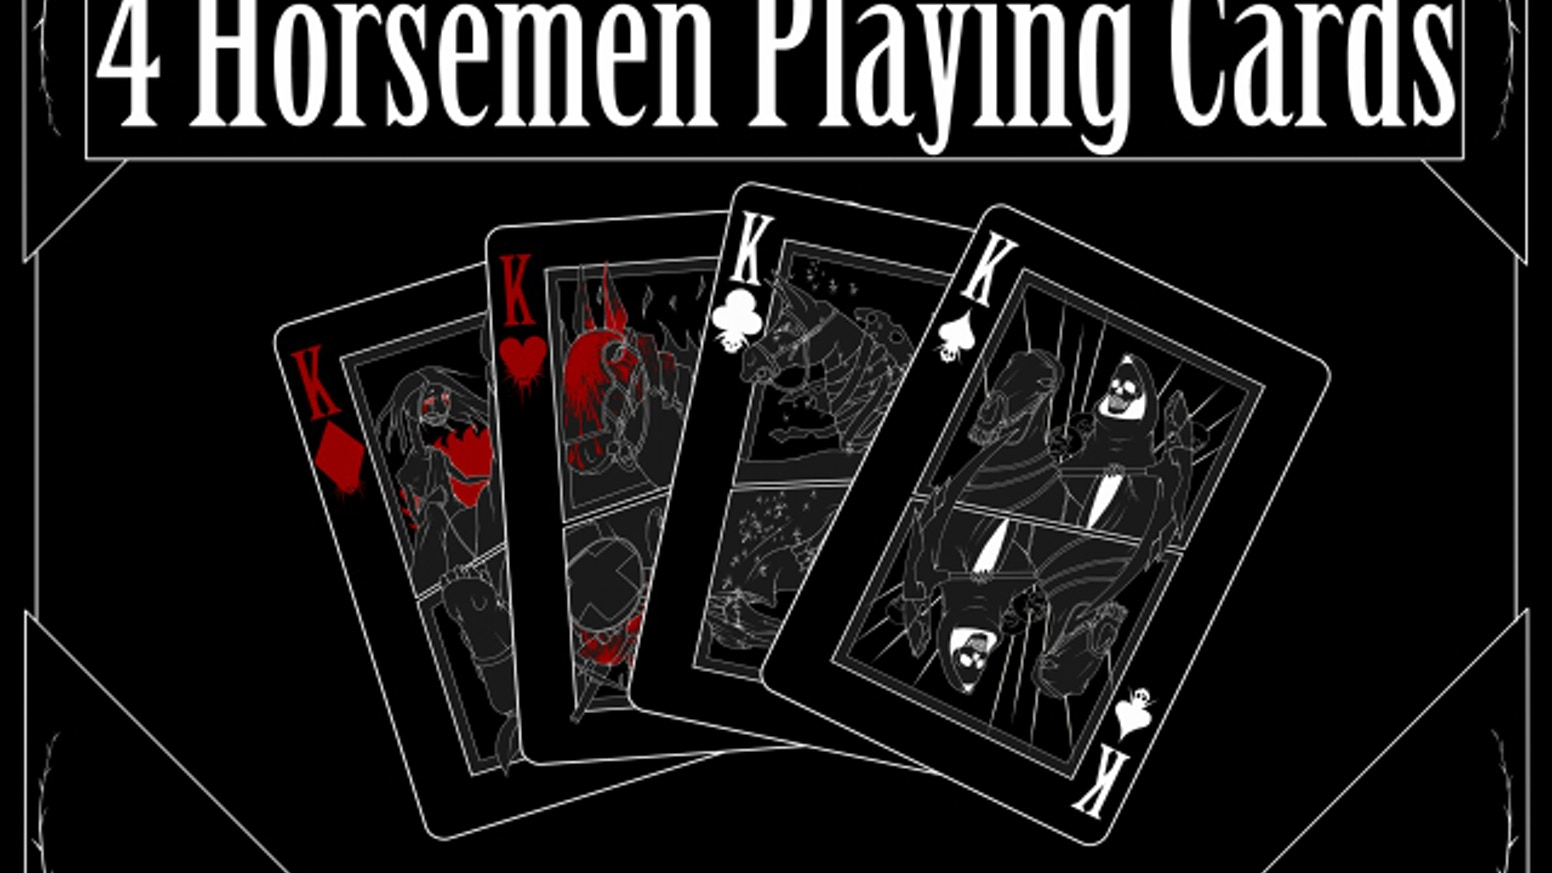 4 Horsemen Playing Cards Art By Krinkels Sean Jentis Kickstarter